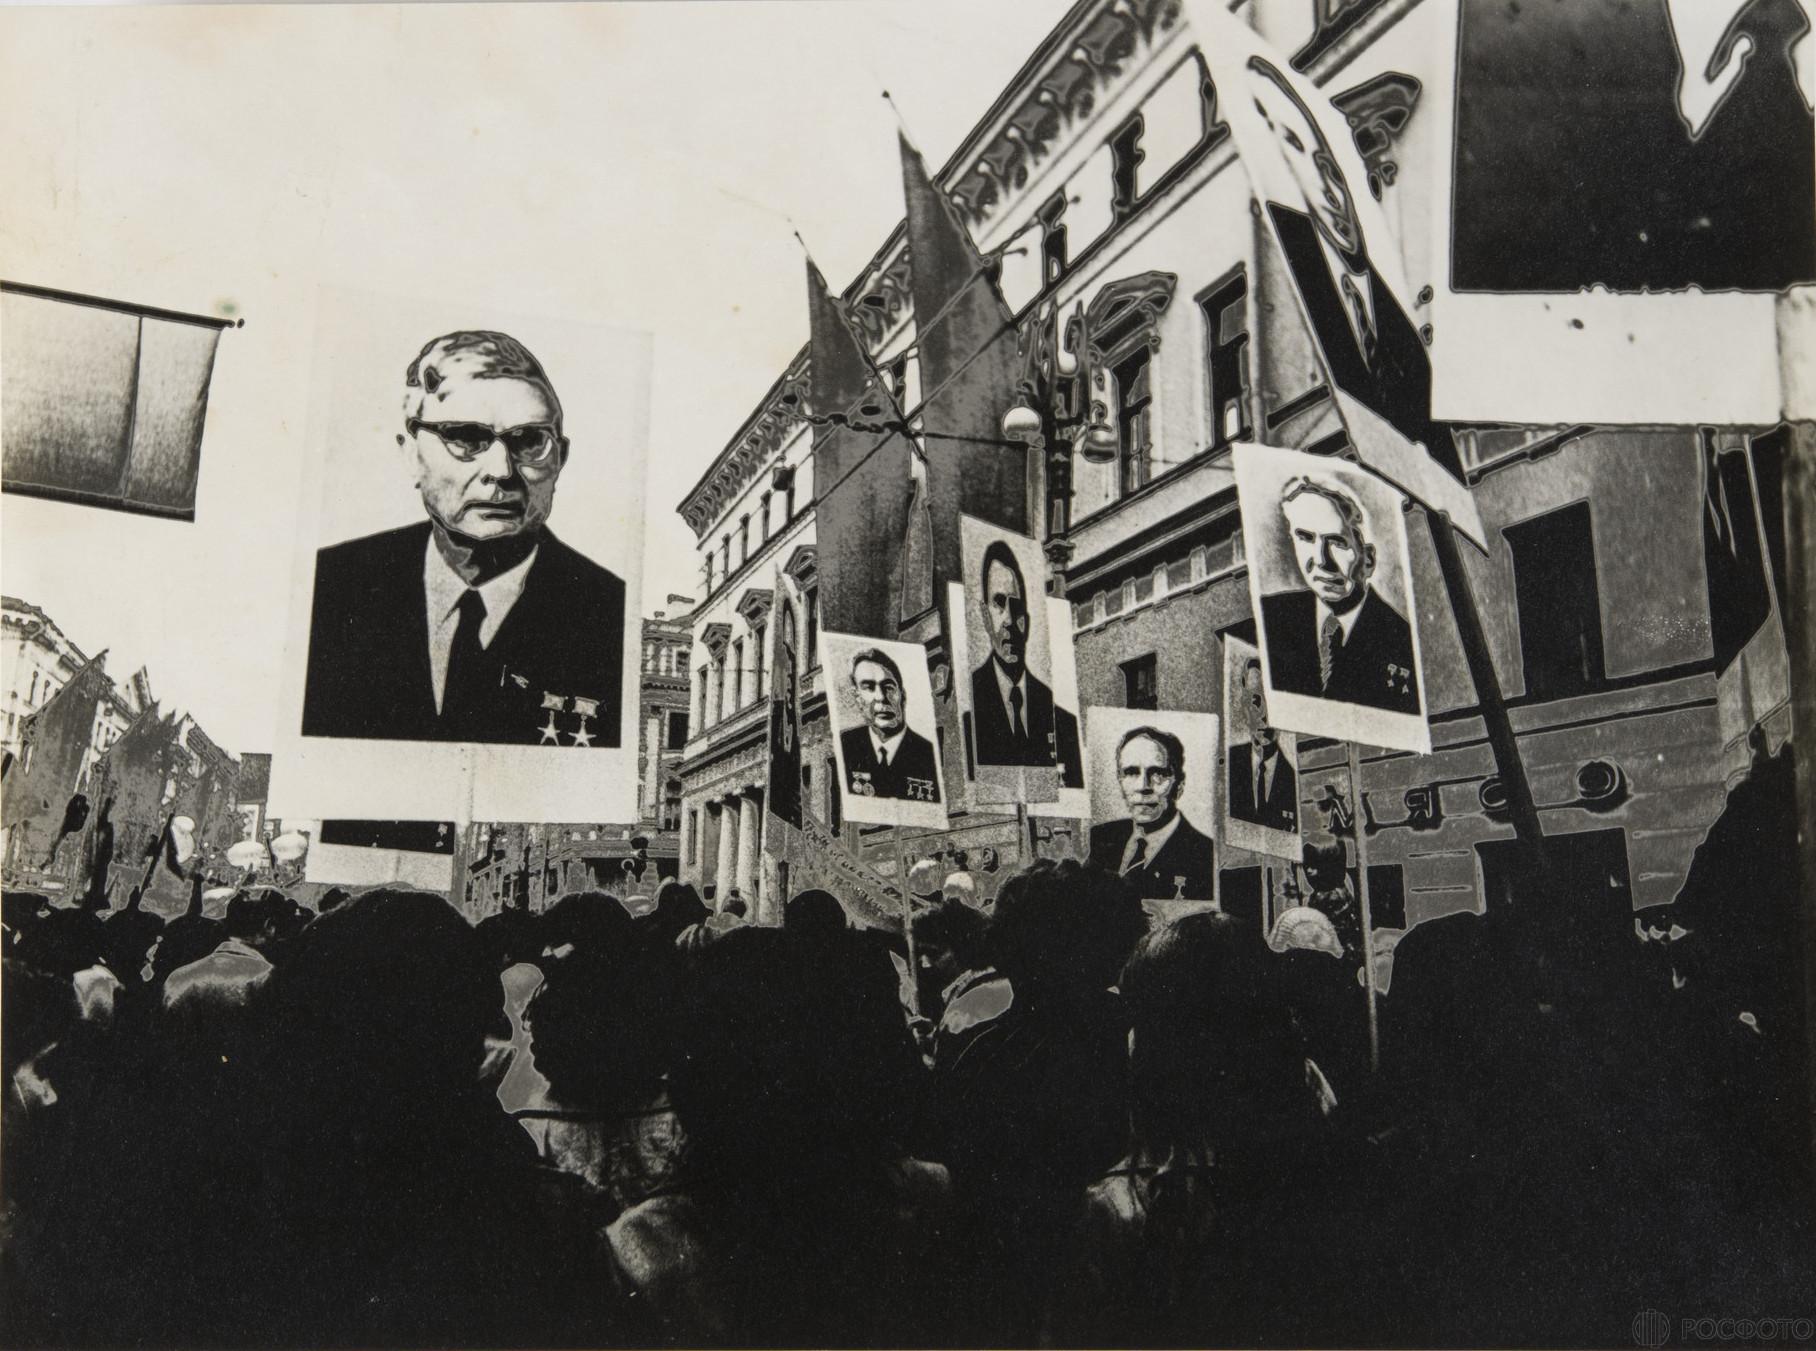 1970-е. Из цикла «Демонстрация». Без названия